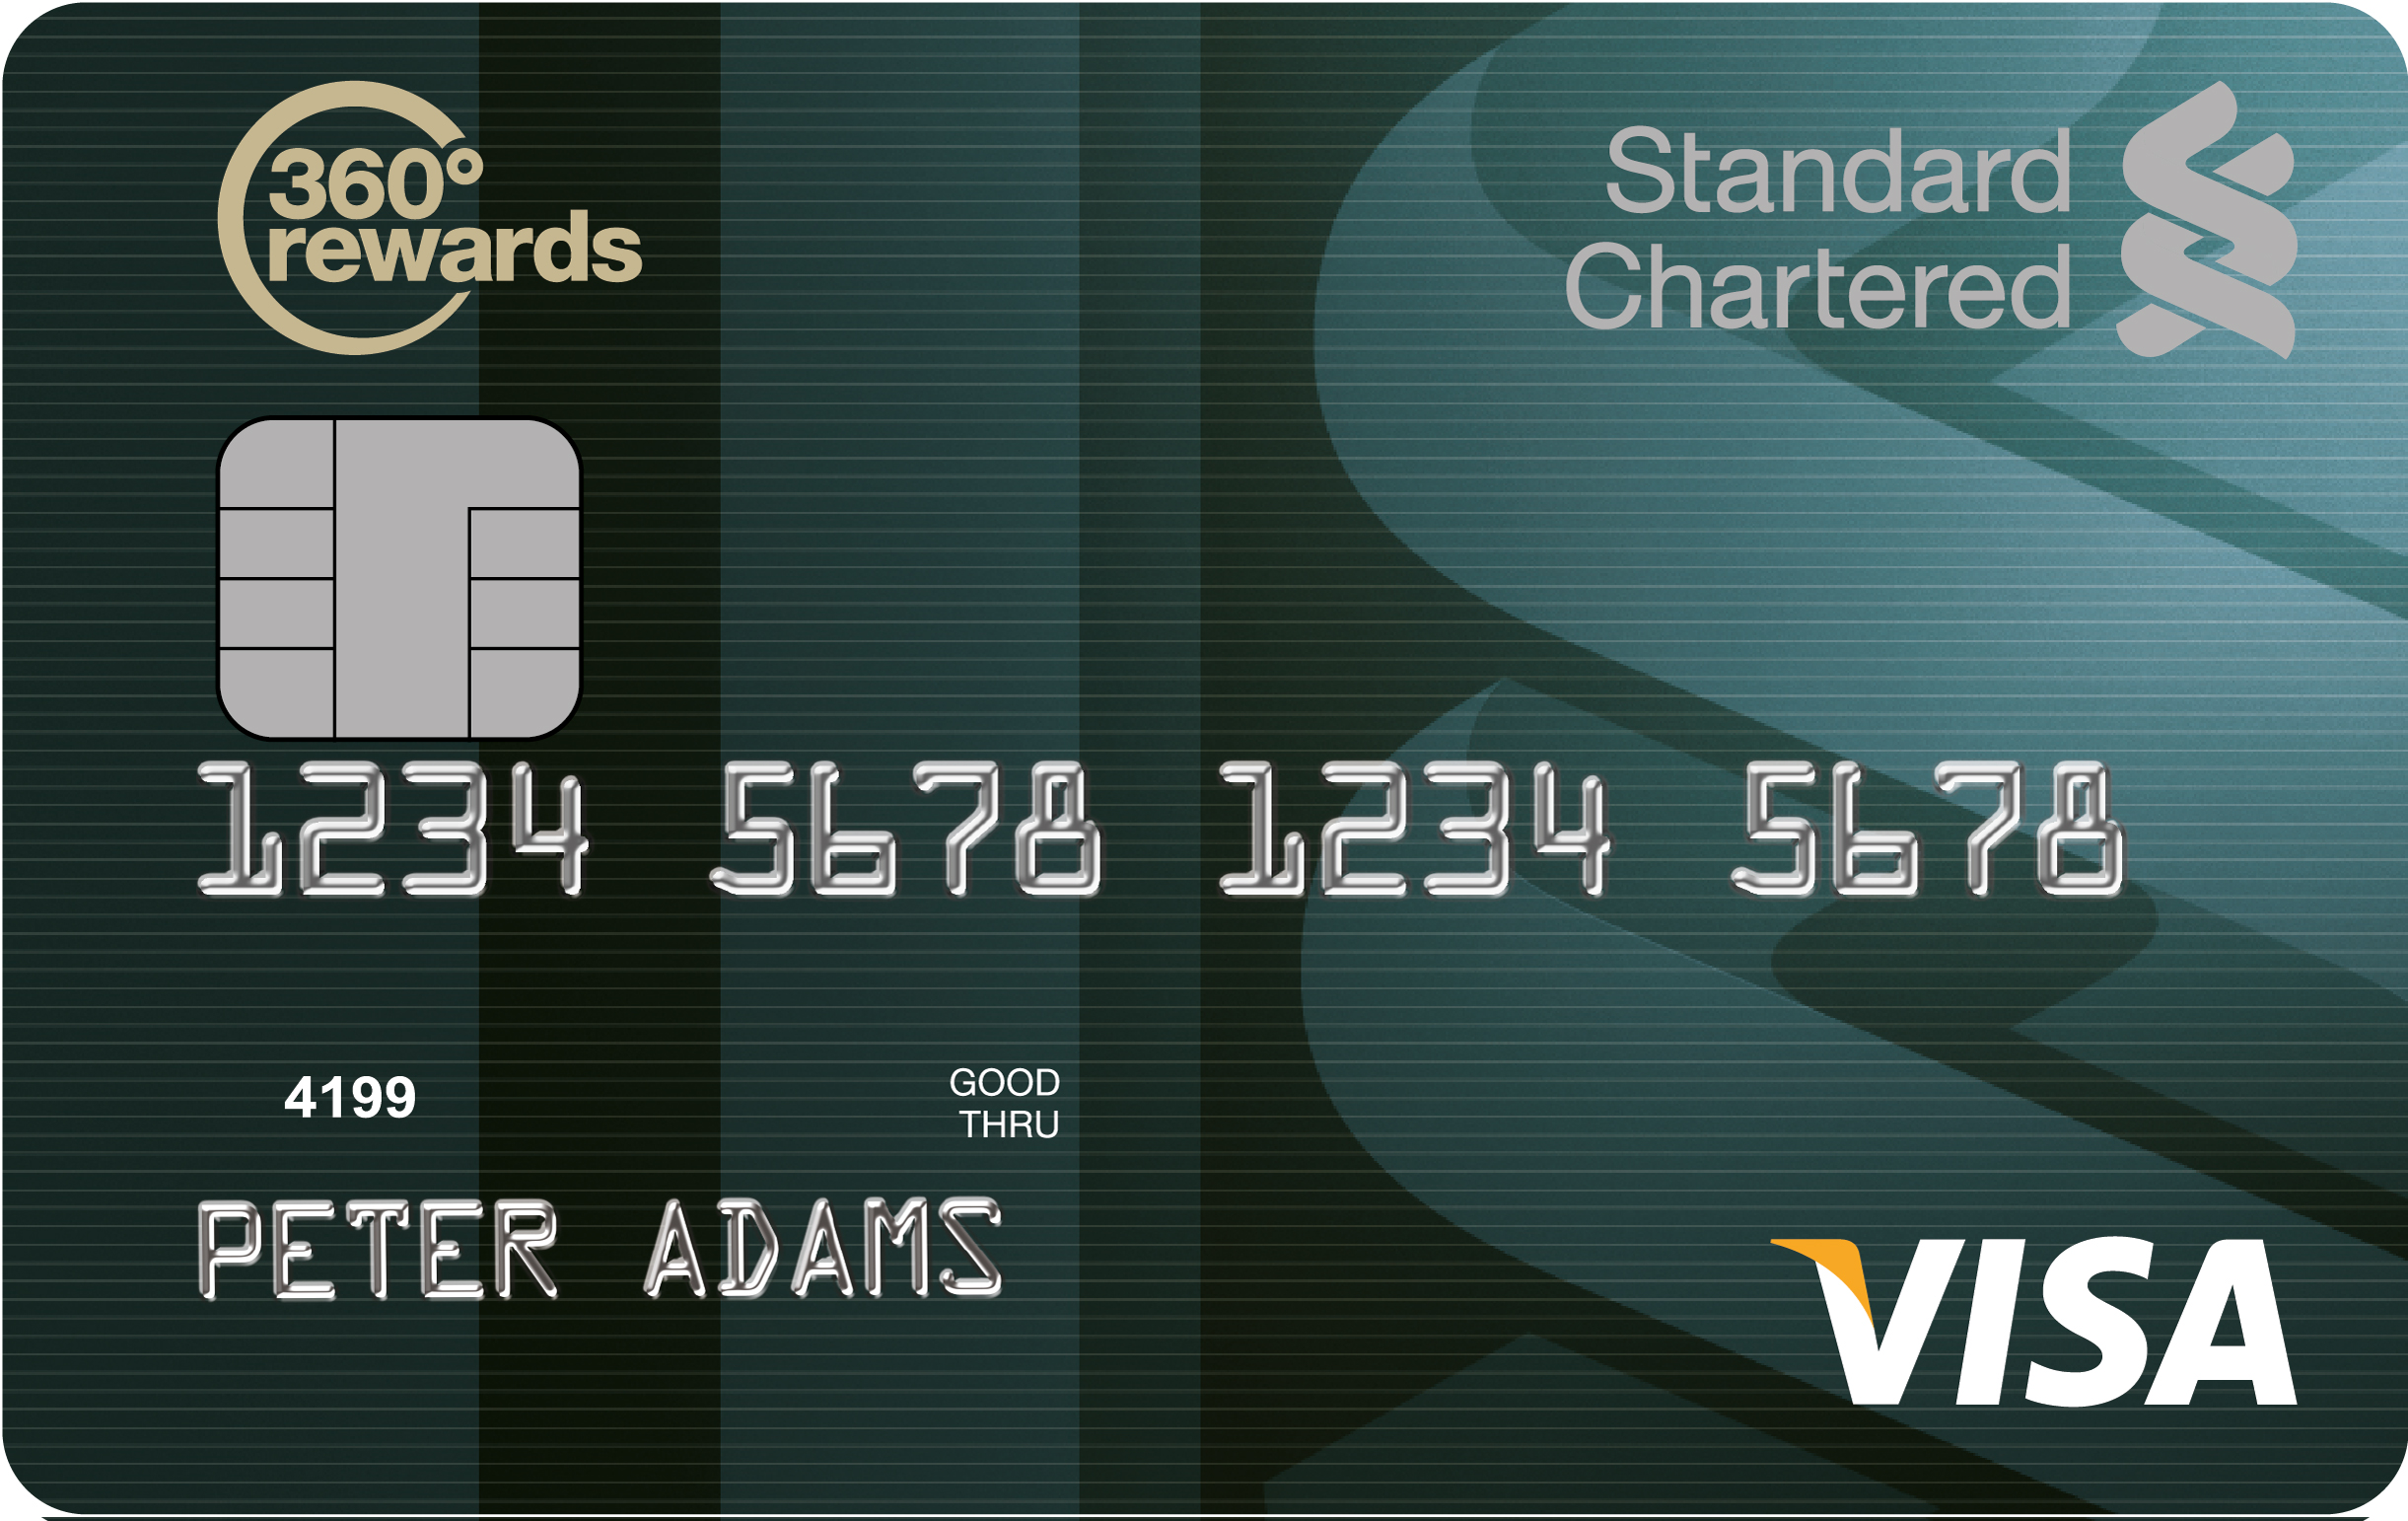 Standard chartered bank visa signature credit card reheart Gallery